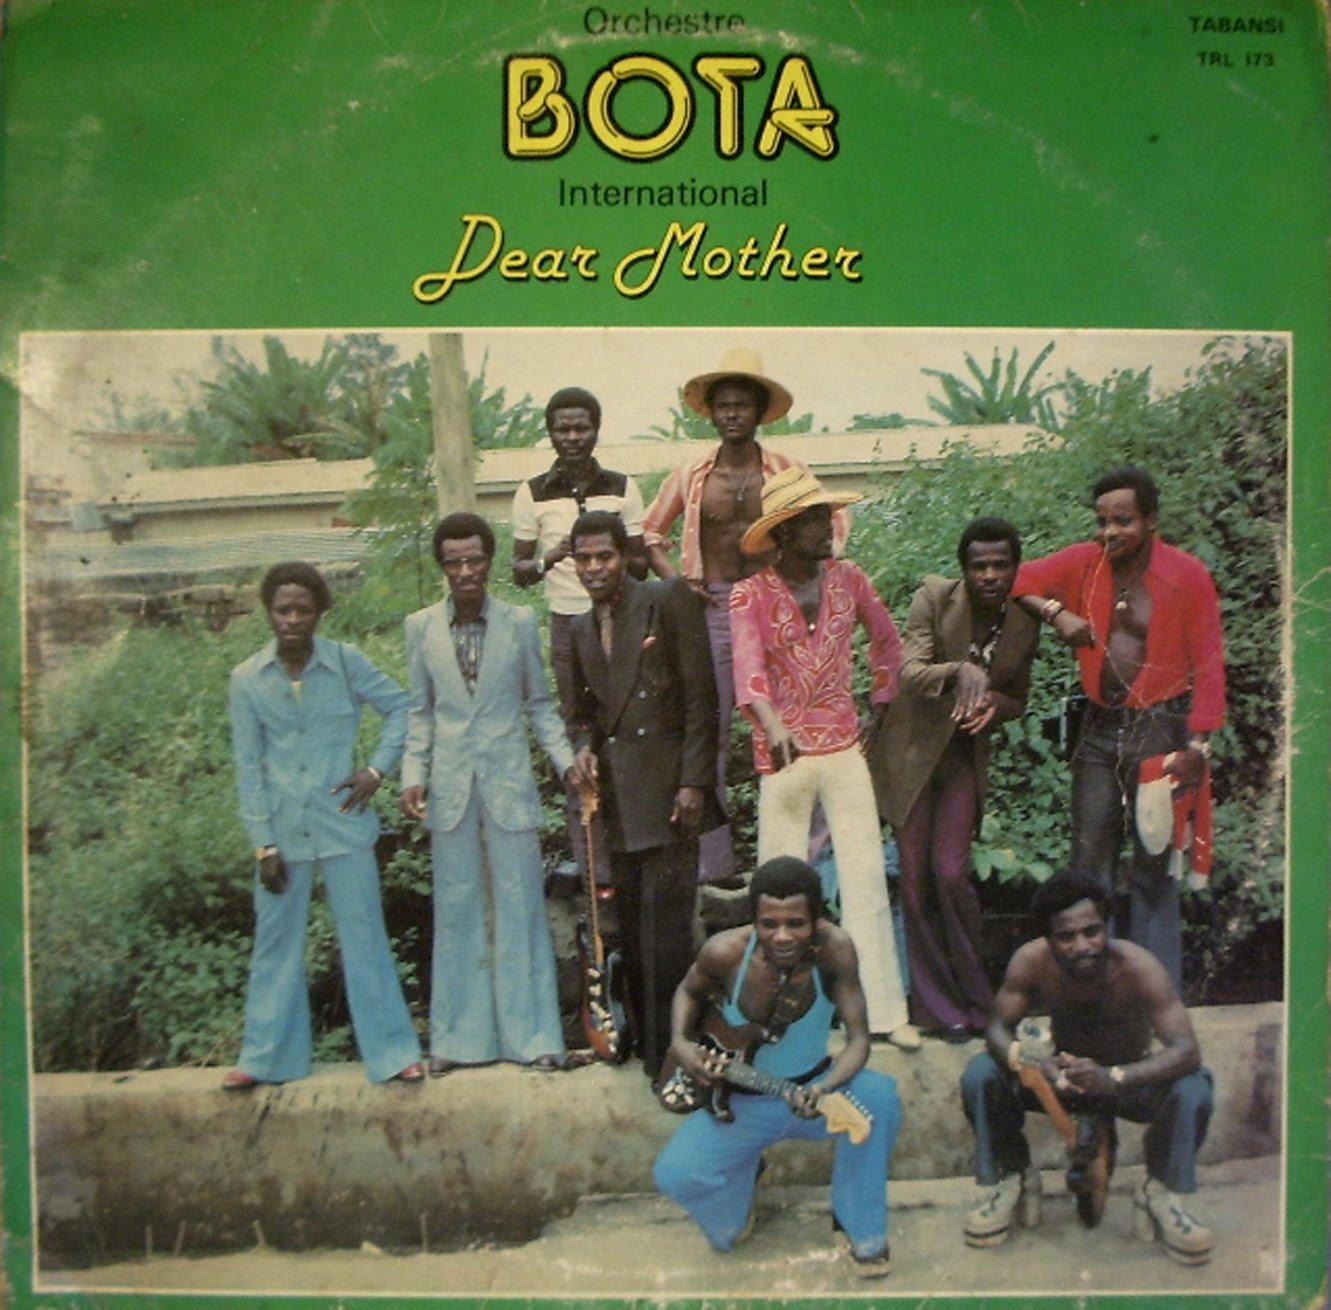 Orchestre Bota Tabansi International Mister Man